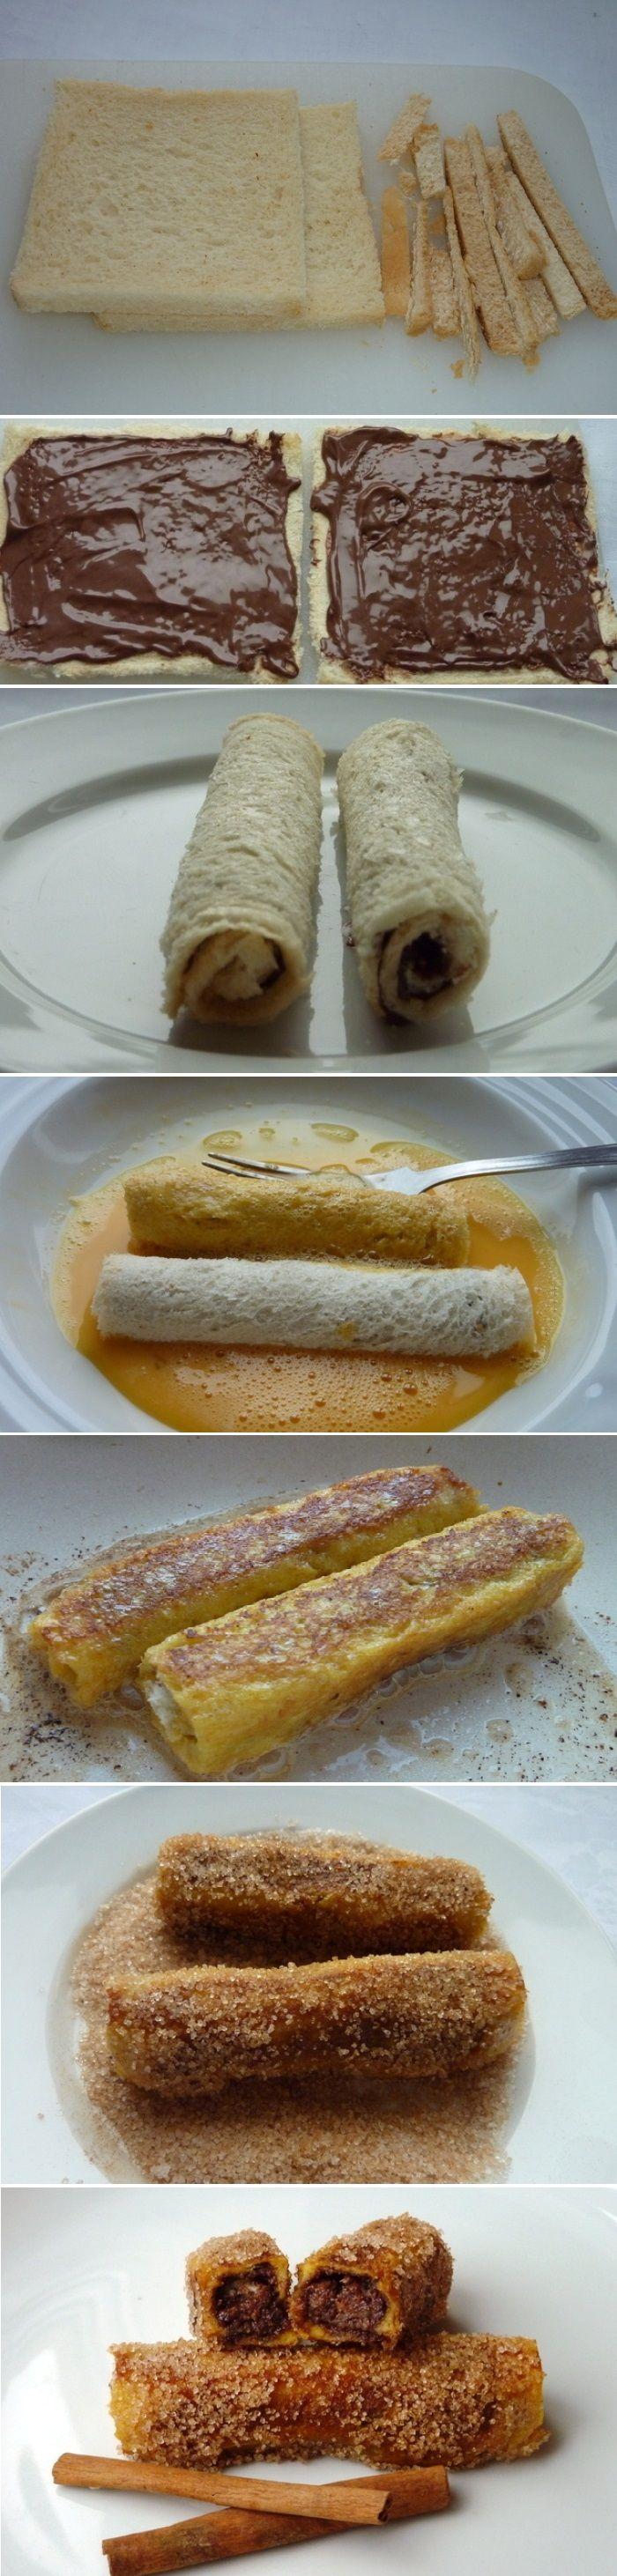 Ingredients 10 slices of toast or other soft thin white bread 10 tbs Nutella spread 1 egg 1-2 tbs milk 1/2 teaspoon sugar 1 tbs cinnamon 1-2 tbs oil